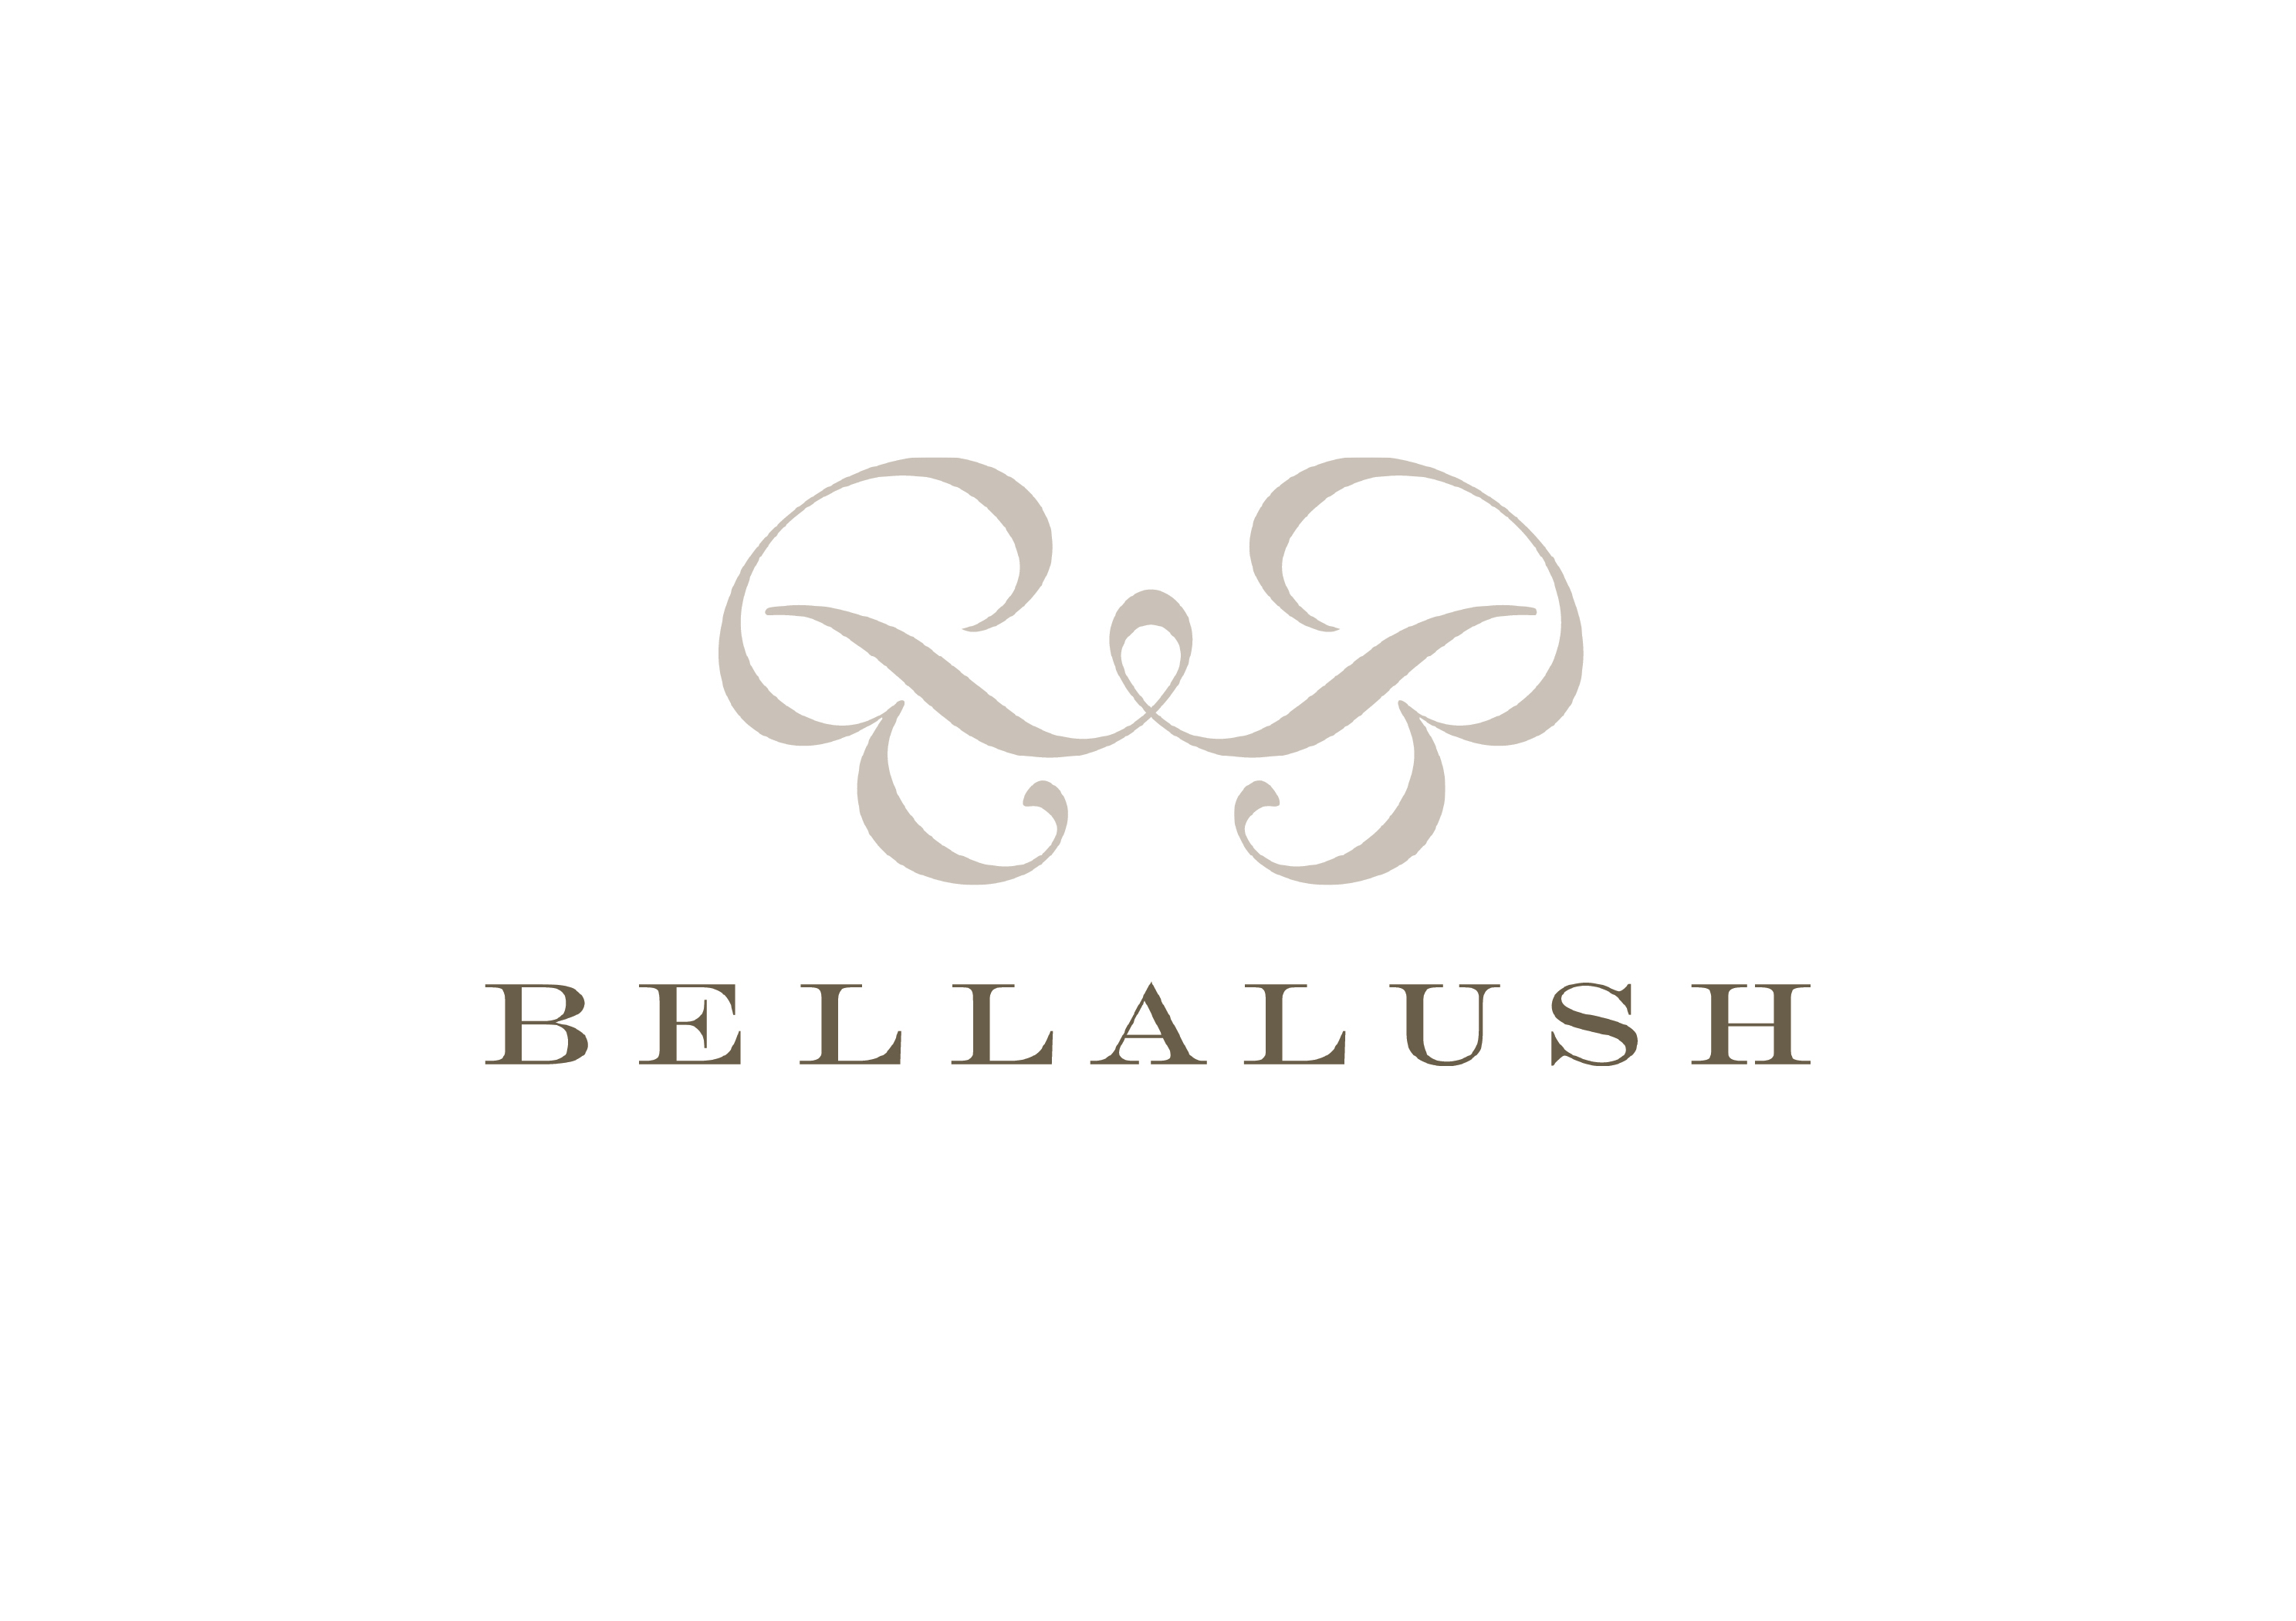 Blellalush Brand Identity